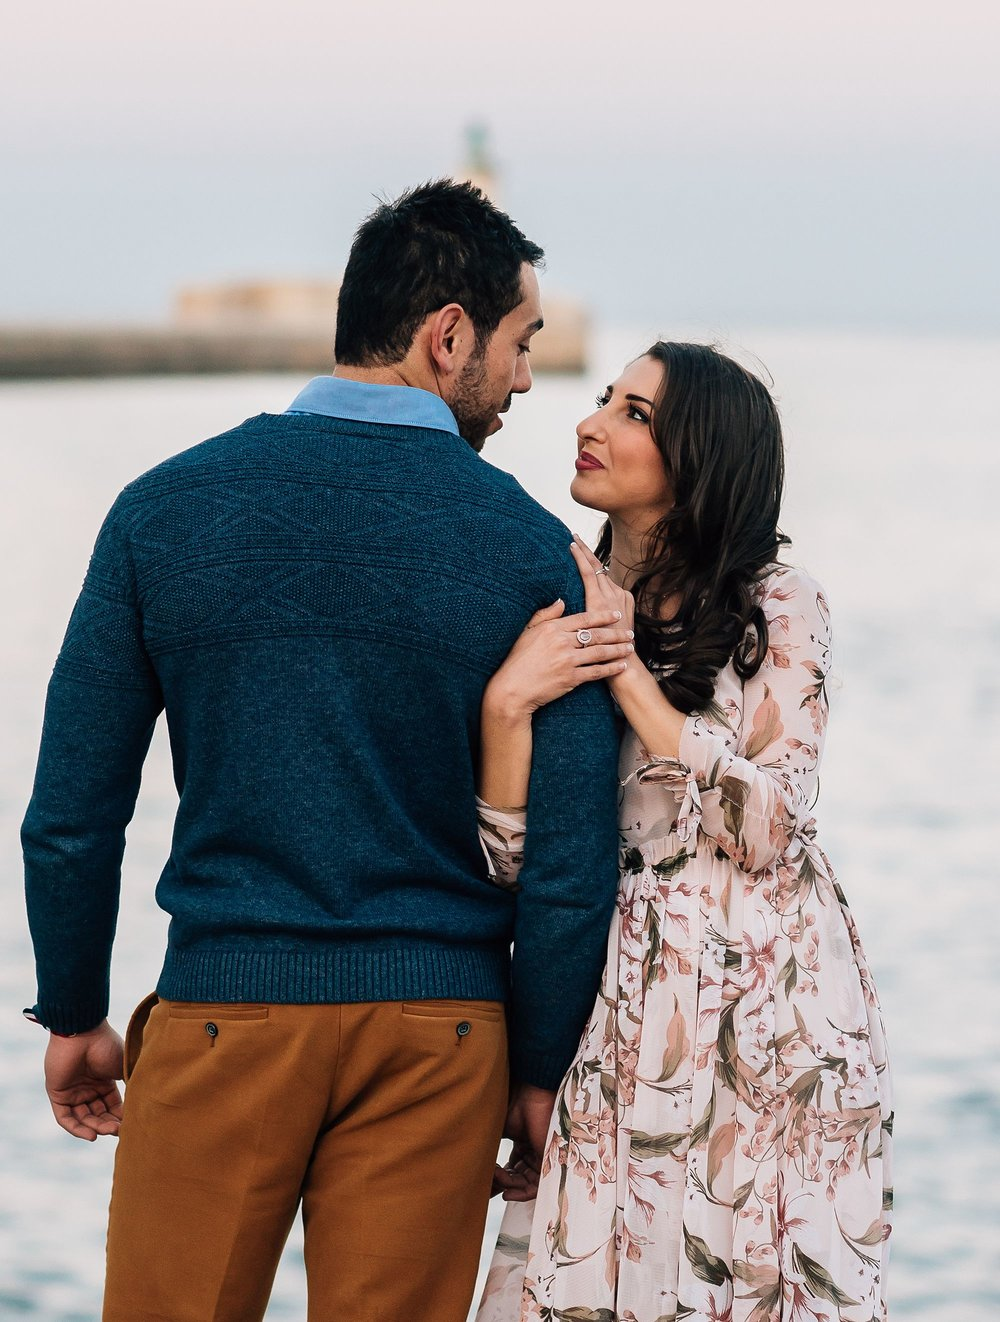 Sarah & Daniel - Pre-Wedding Shoot - Malta - Shane P. Watts Photography